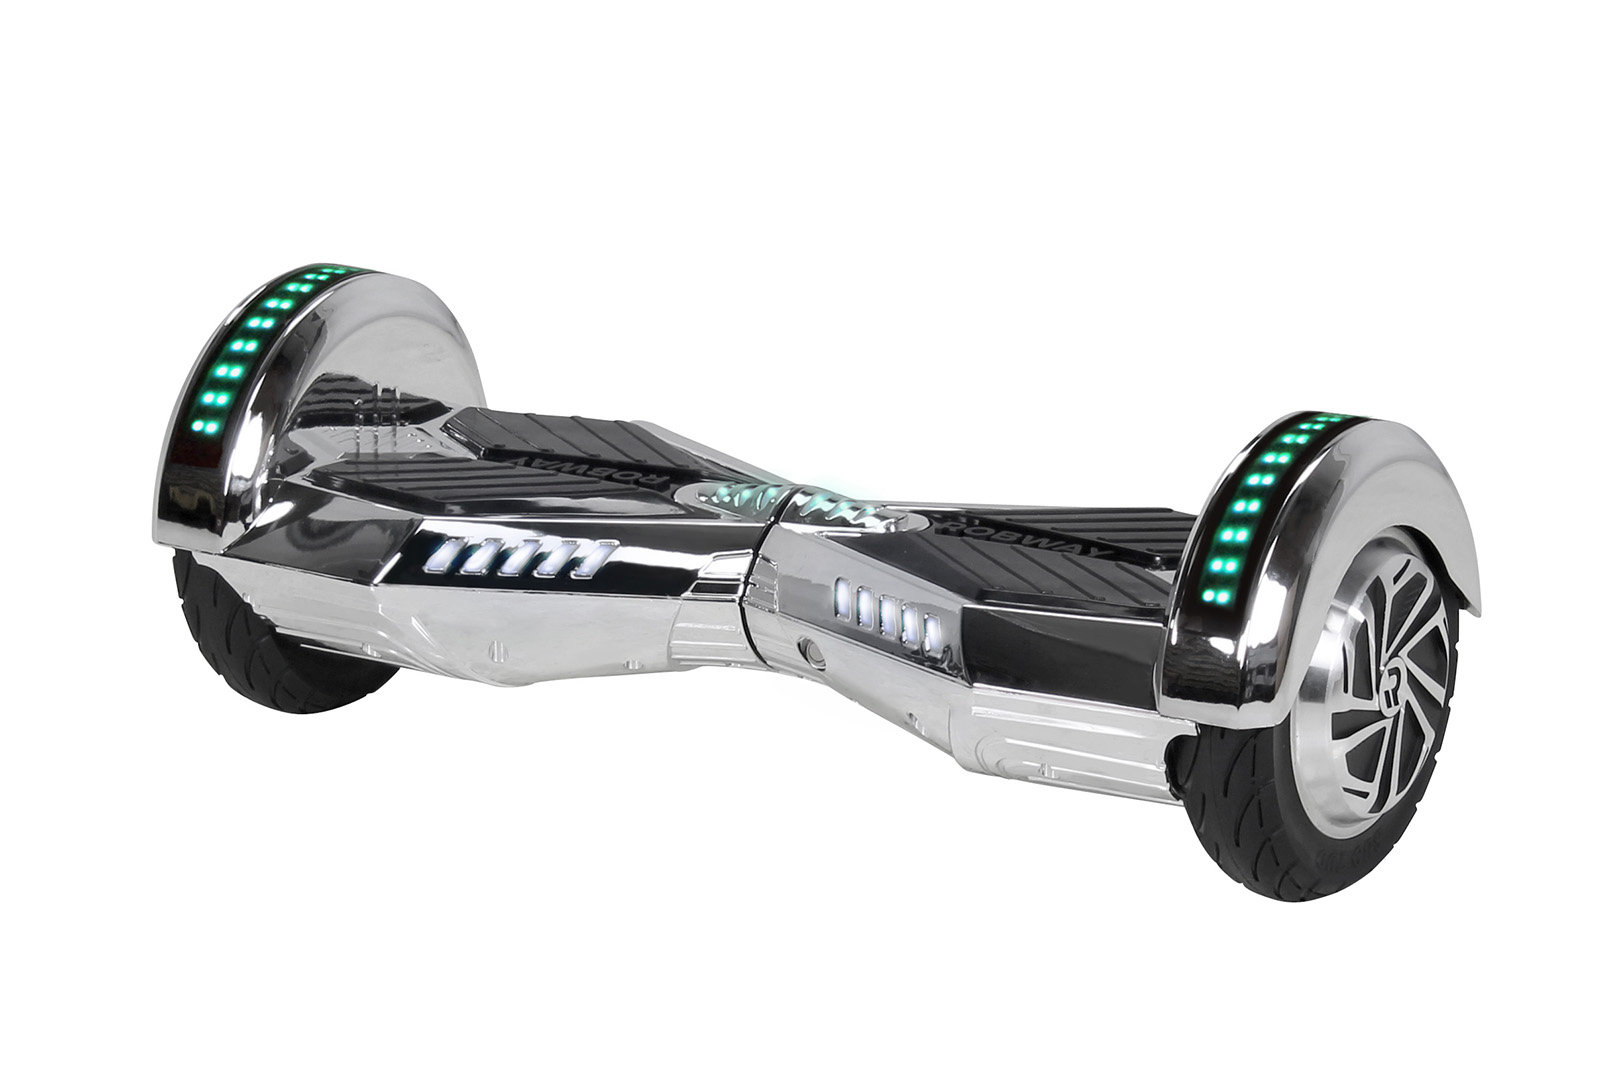 testsieger self balancing scooter hoverboards von robway jetzt kaufen miweba gmbh. Black Bedroom Furniture Sets. Home Design Ideas